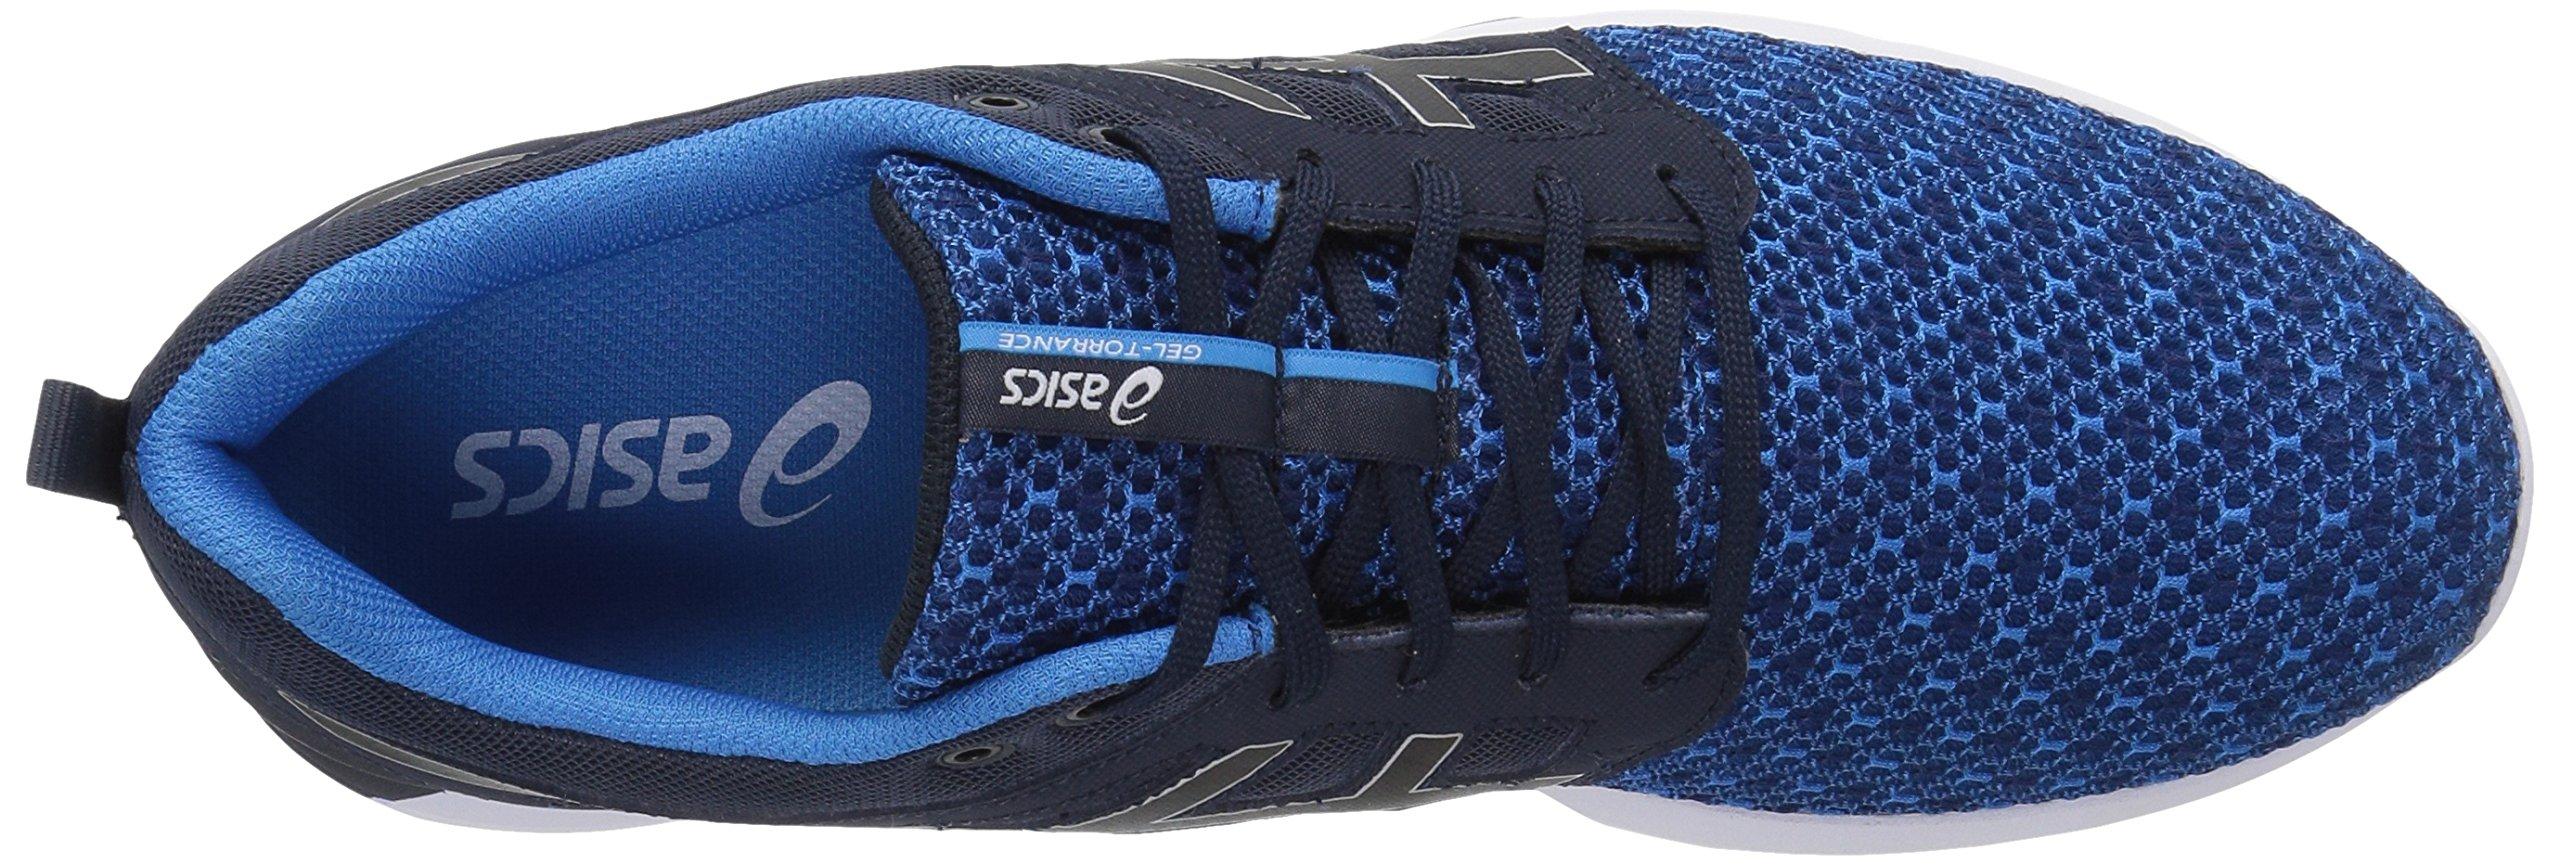 1de272781524 ASICS Men s Gel-Torrance Running Shoe India Ink Black Silver 11 M US -  T745N.5890   Road Running   Clothing